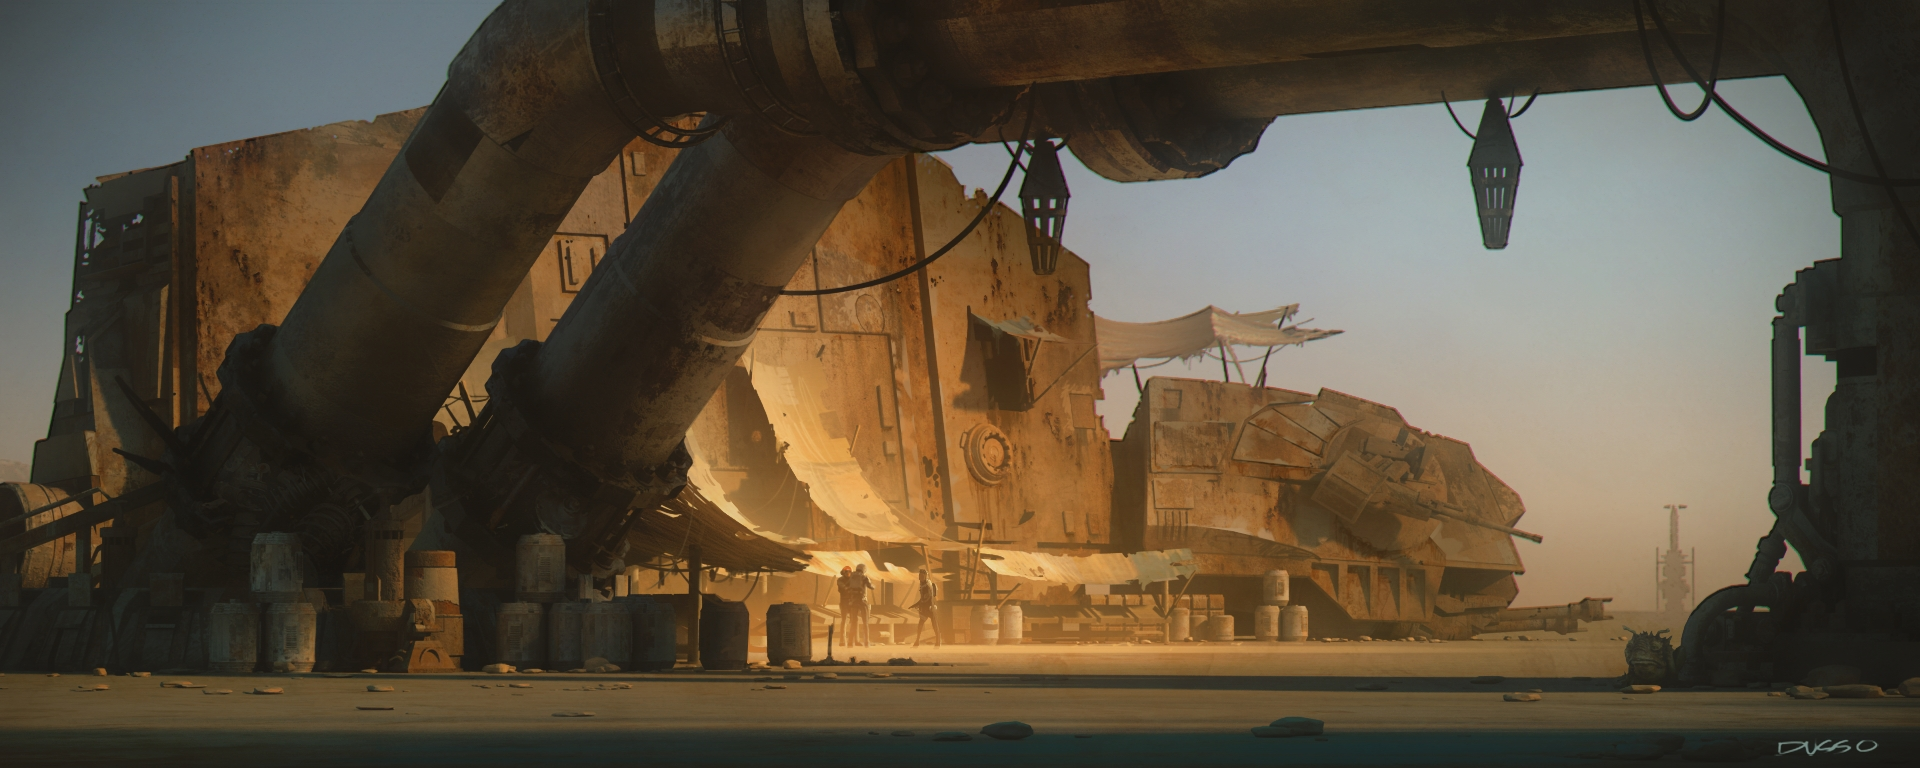 concept-art-dusseault-star-wars-pipes-house